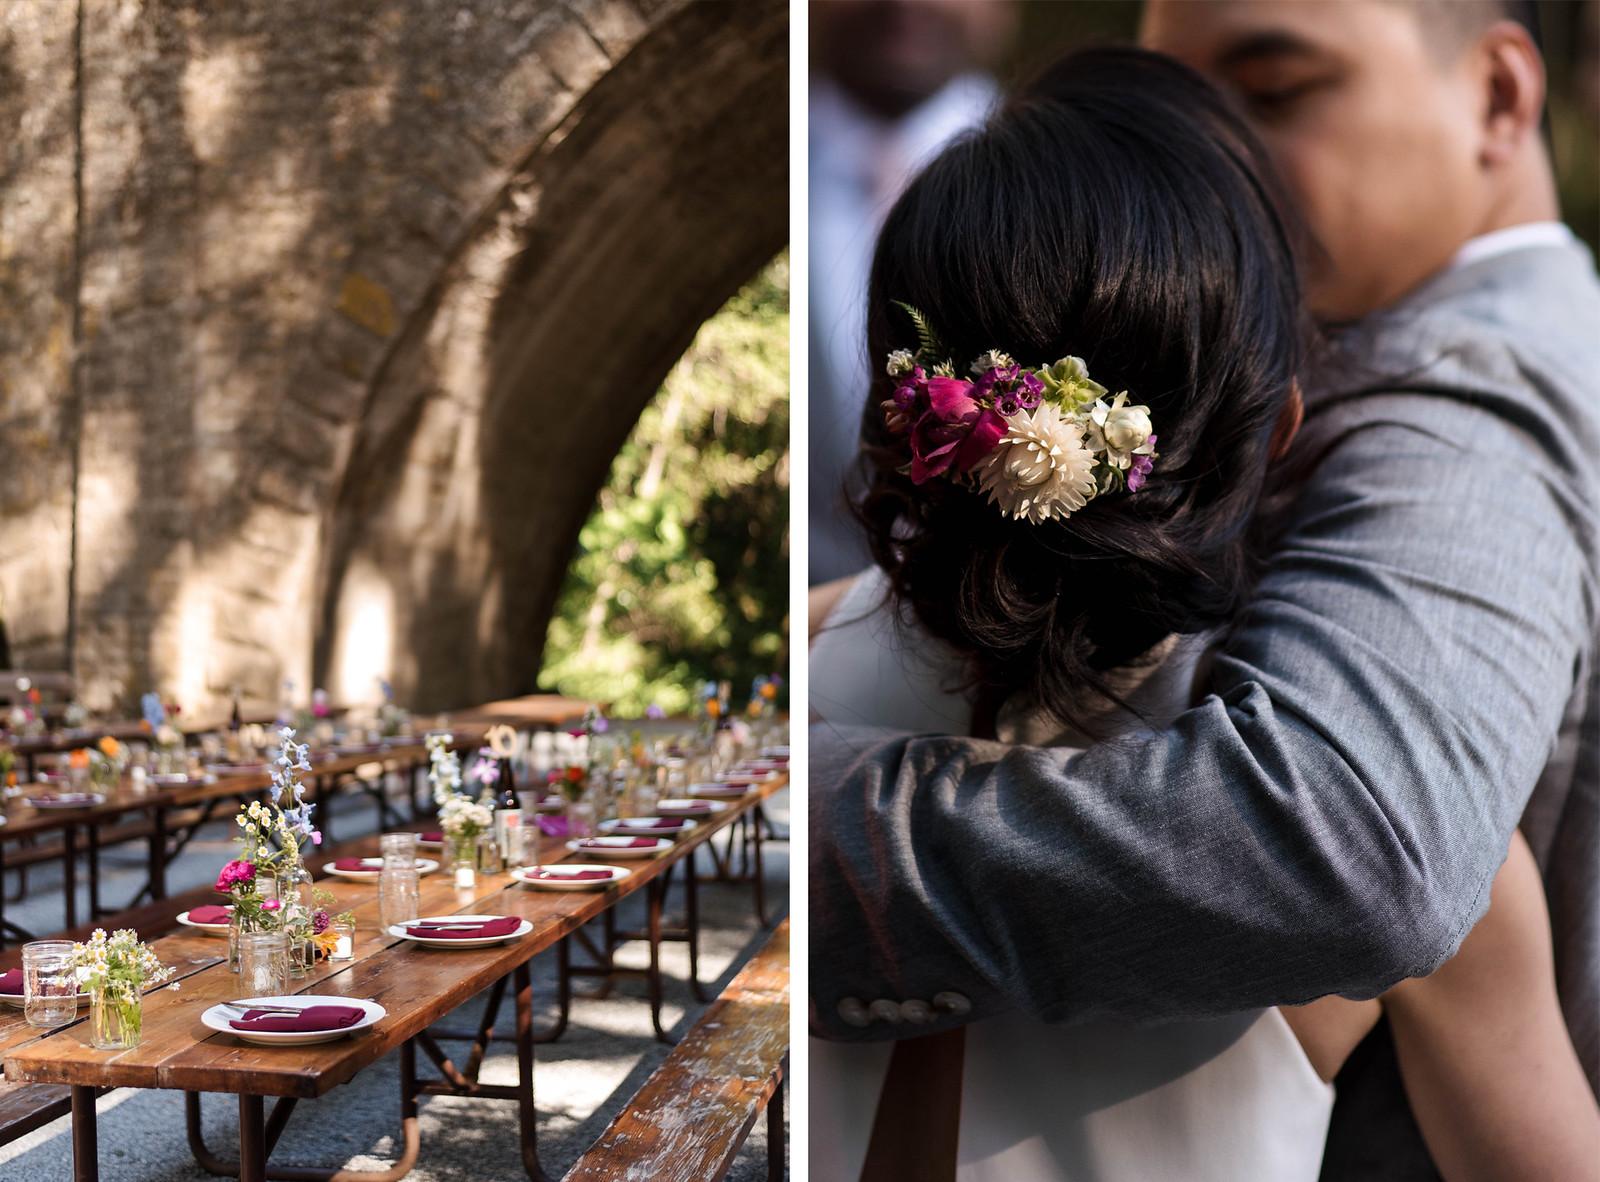 colorful-flowers-wedding-details-california-inspo on juliettelaura.com